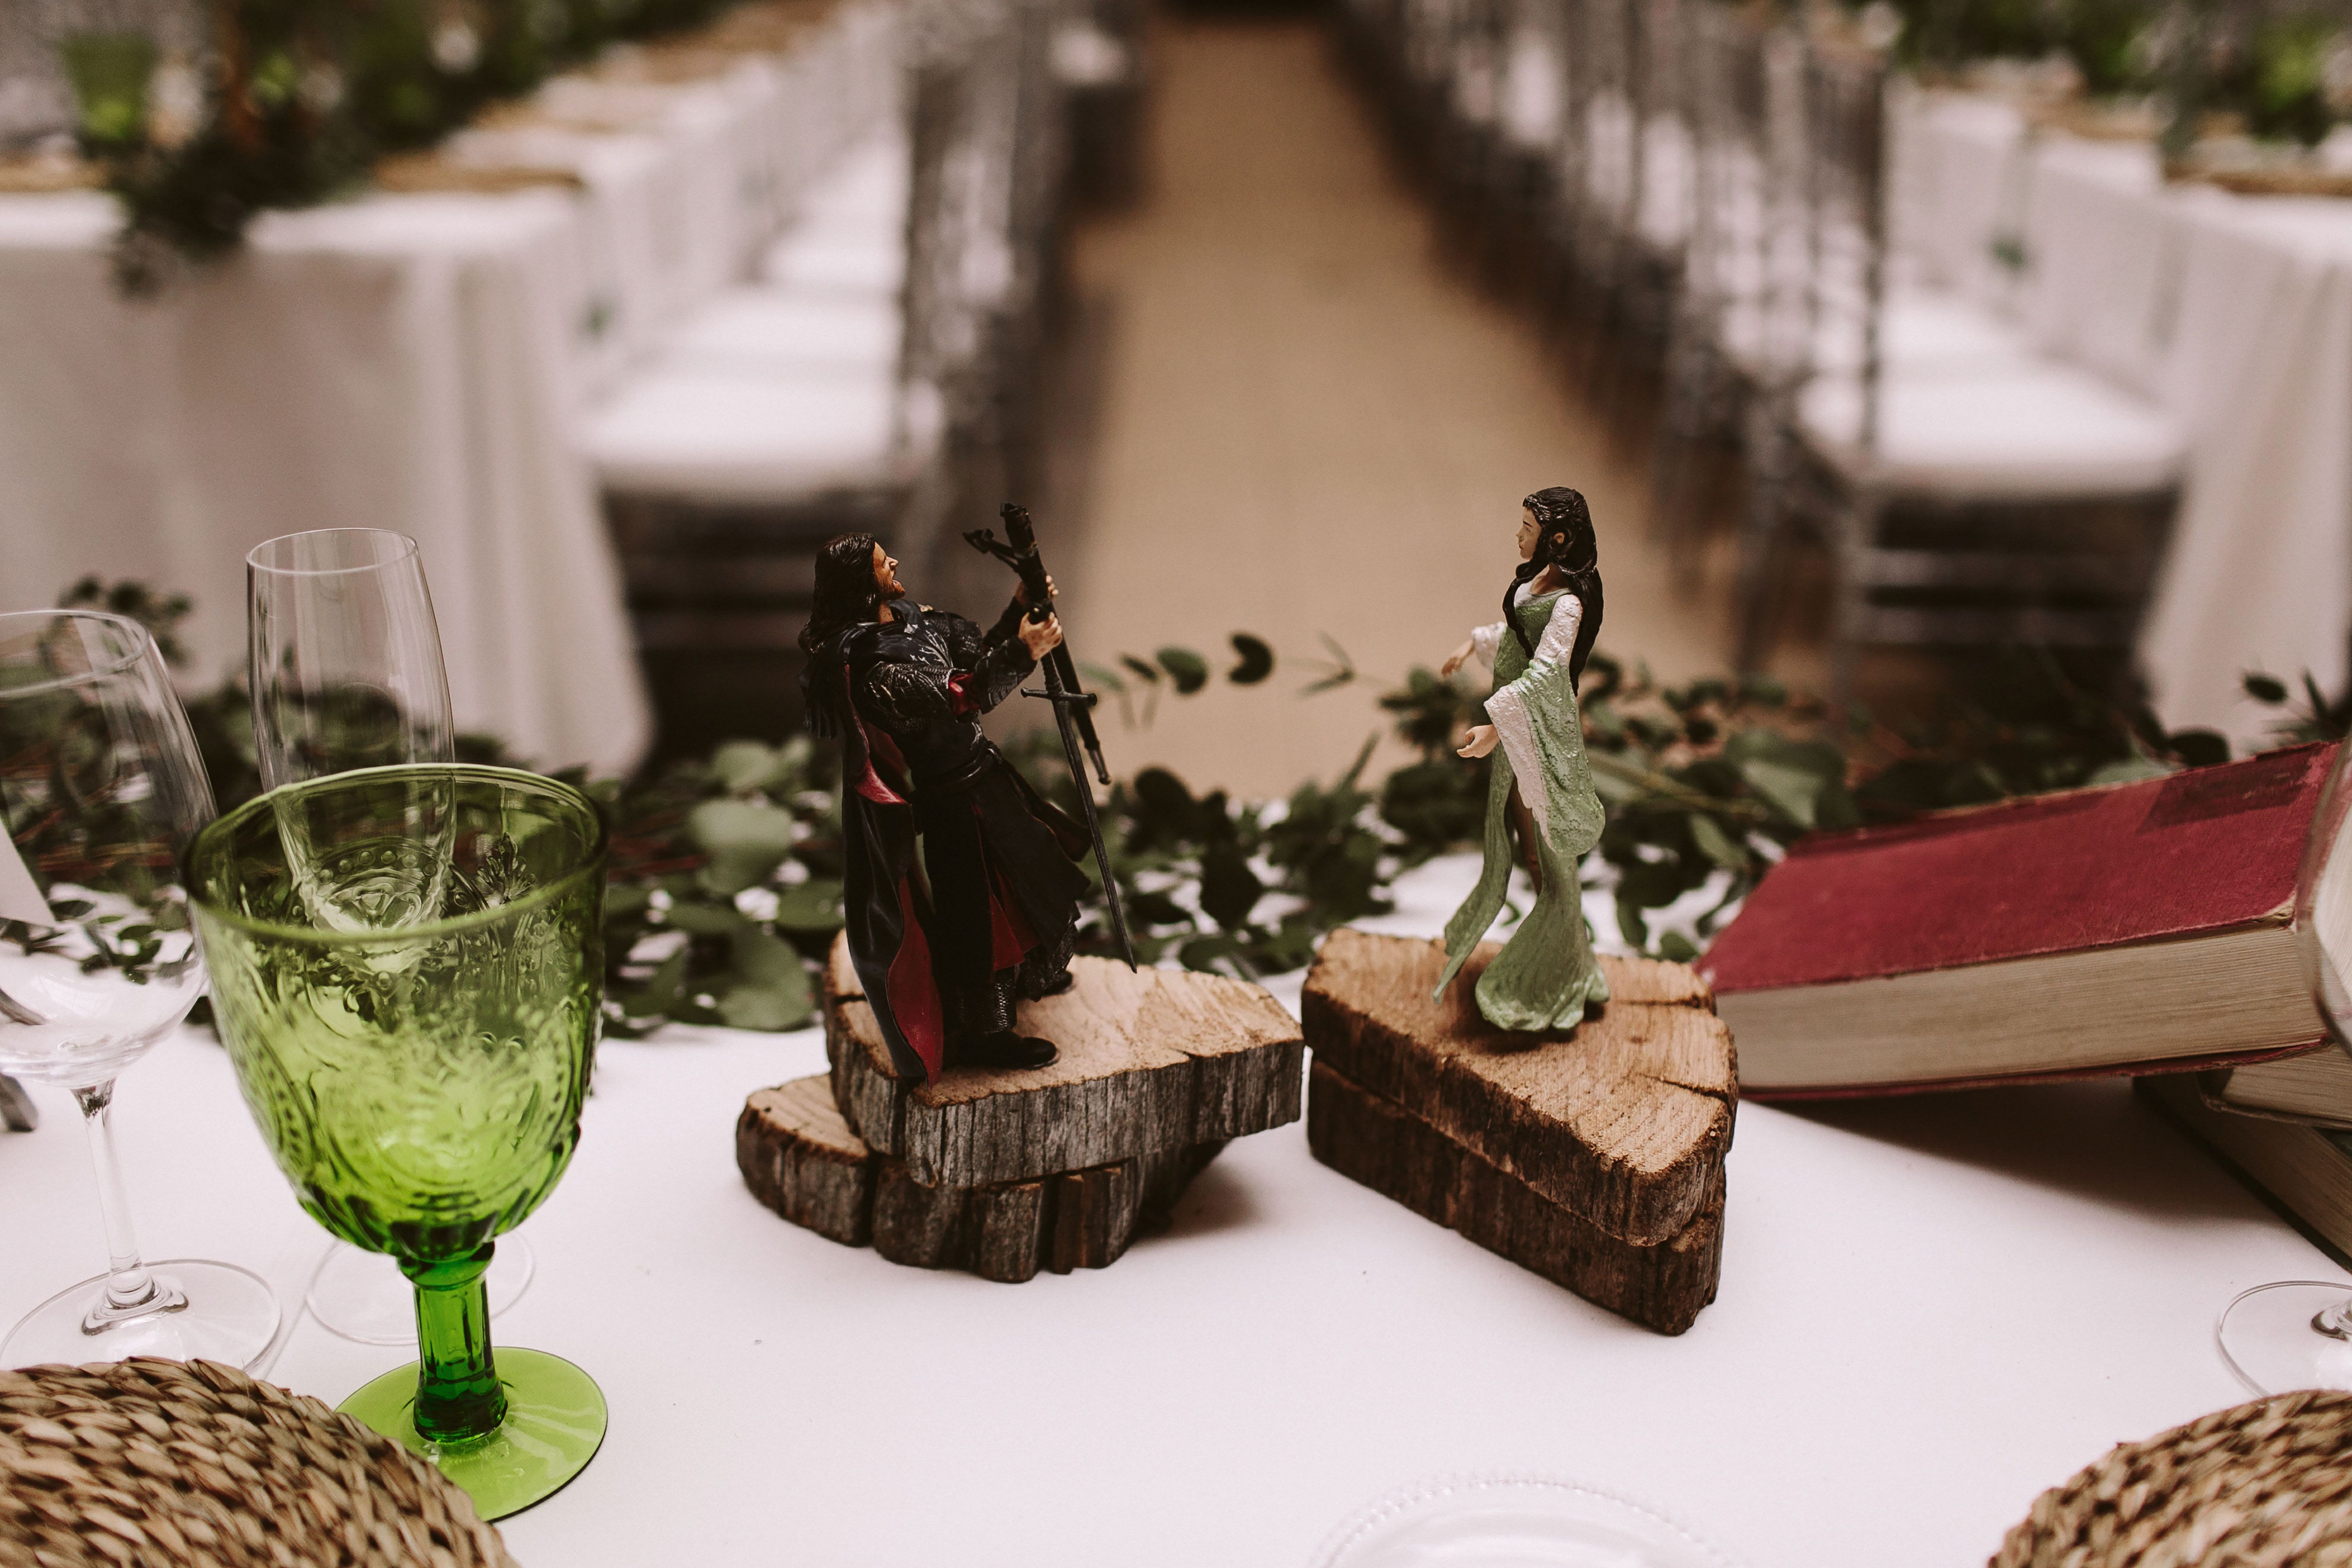 Bereziboda Ide y Rubén Berezi Moments Decoración de Comedor, Monasterio del Espino